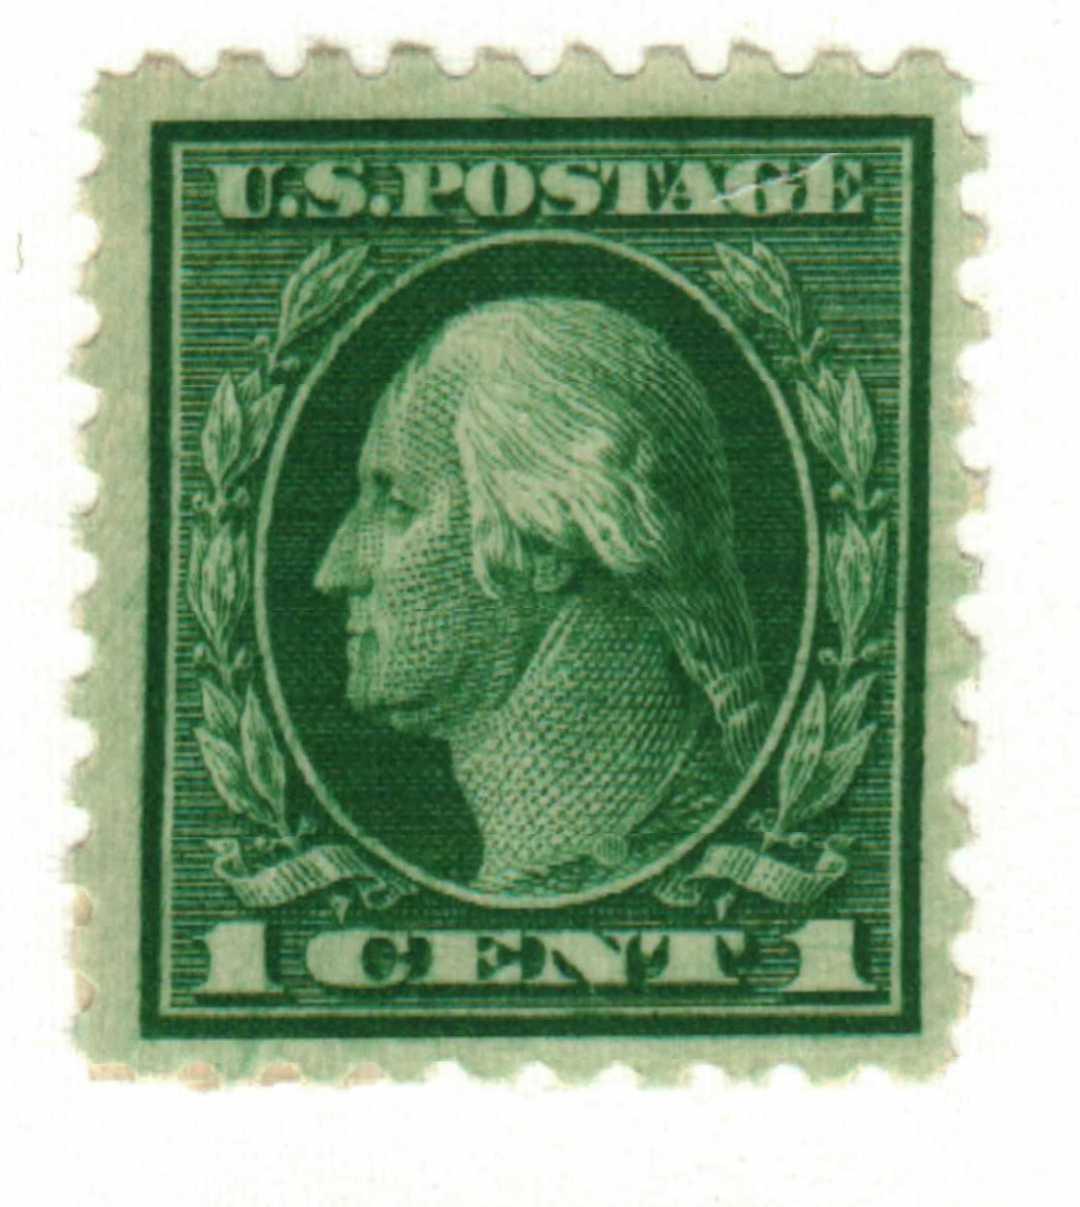 1914 1c Washington Single Line Watermark, green